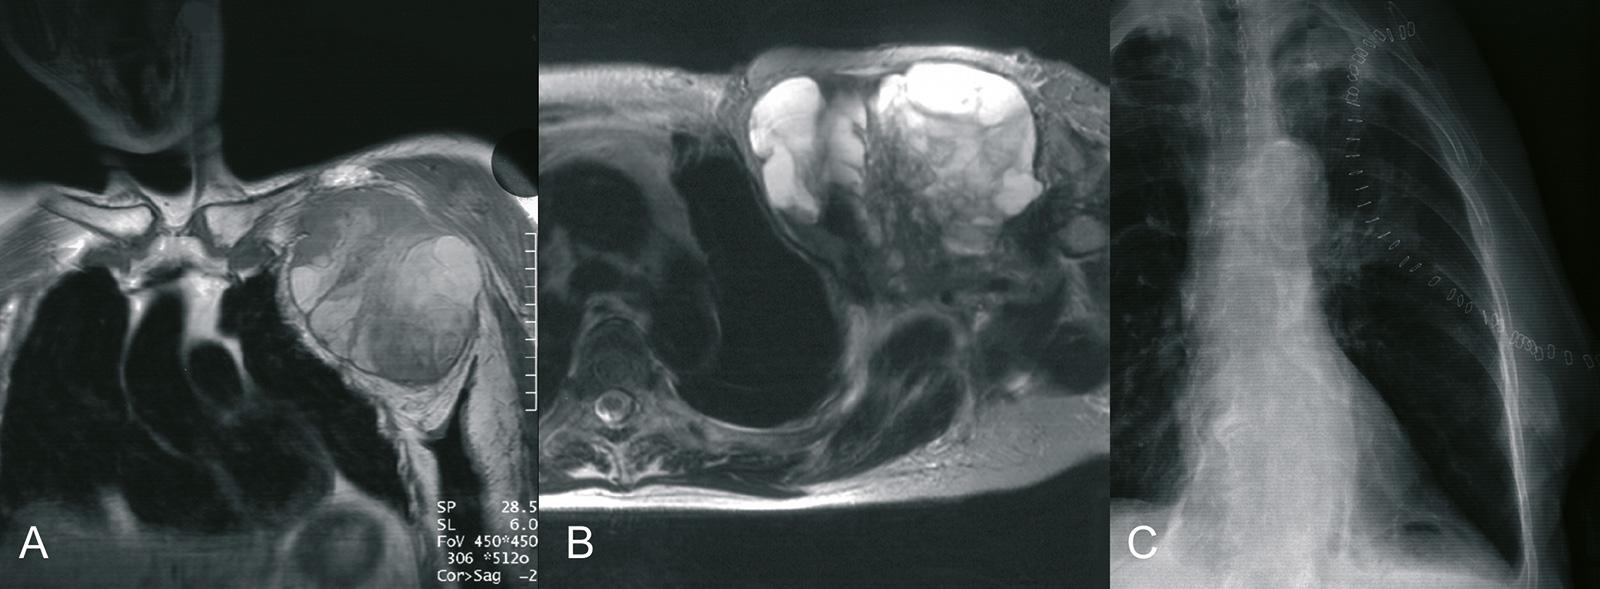 Abb. 8-2: Ausgedehnter Tumor im Bereich der linken Axilla (A-B). Fore Quarter Amputation (C)